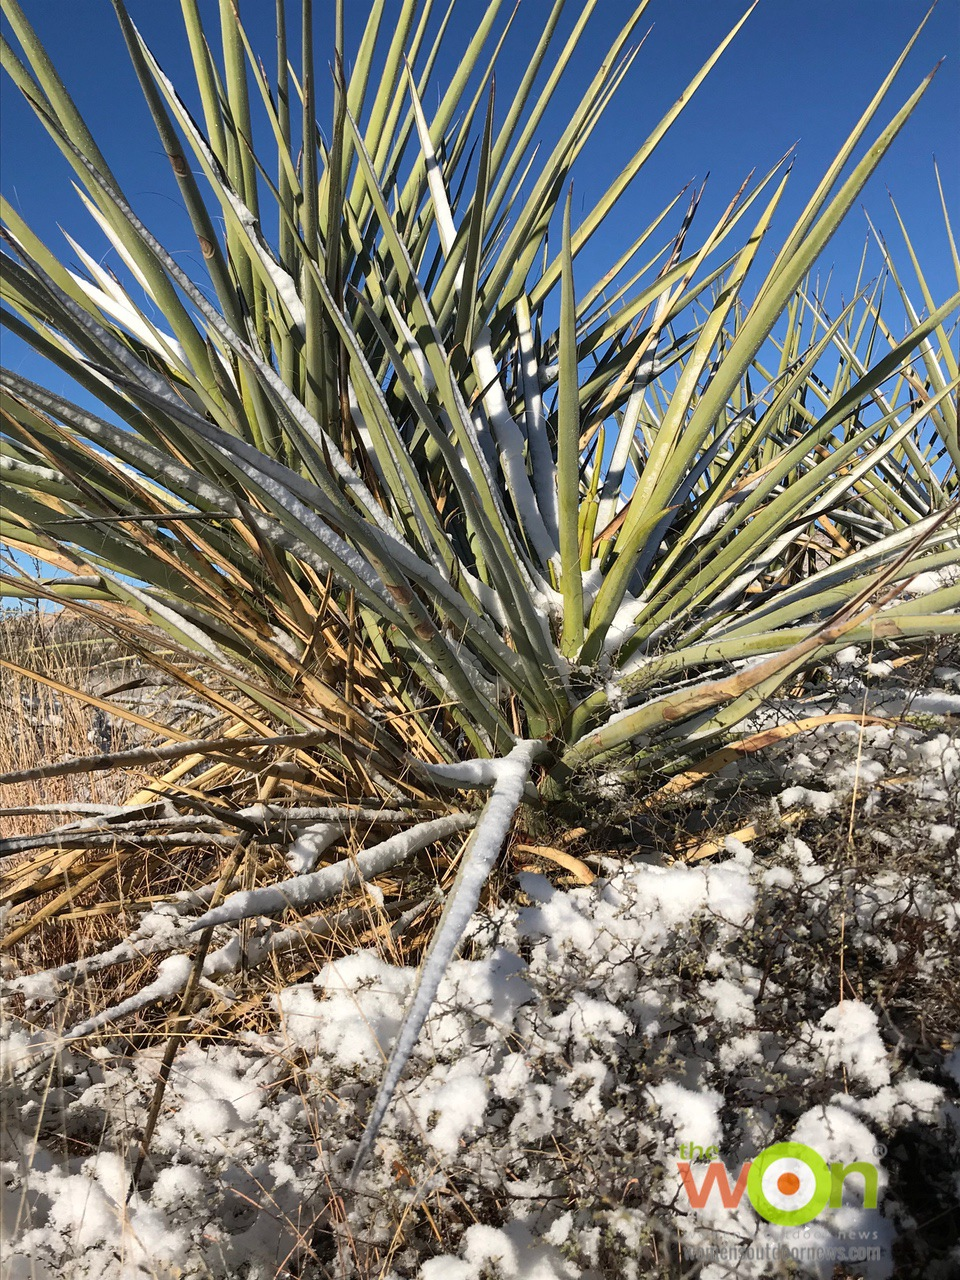 Chihuahuan desert yucca